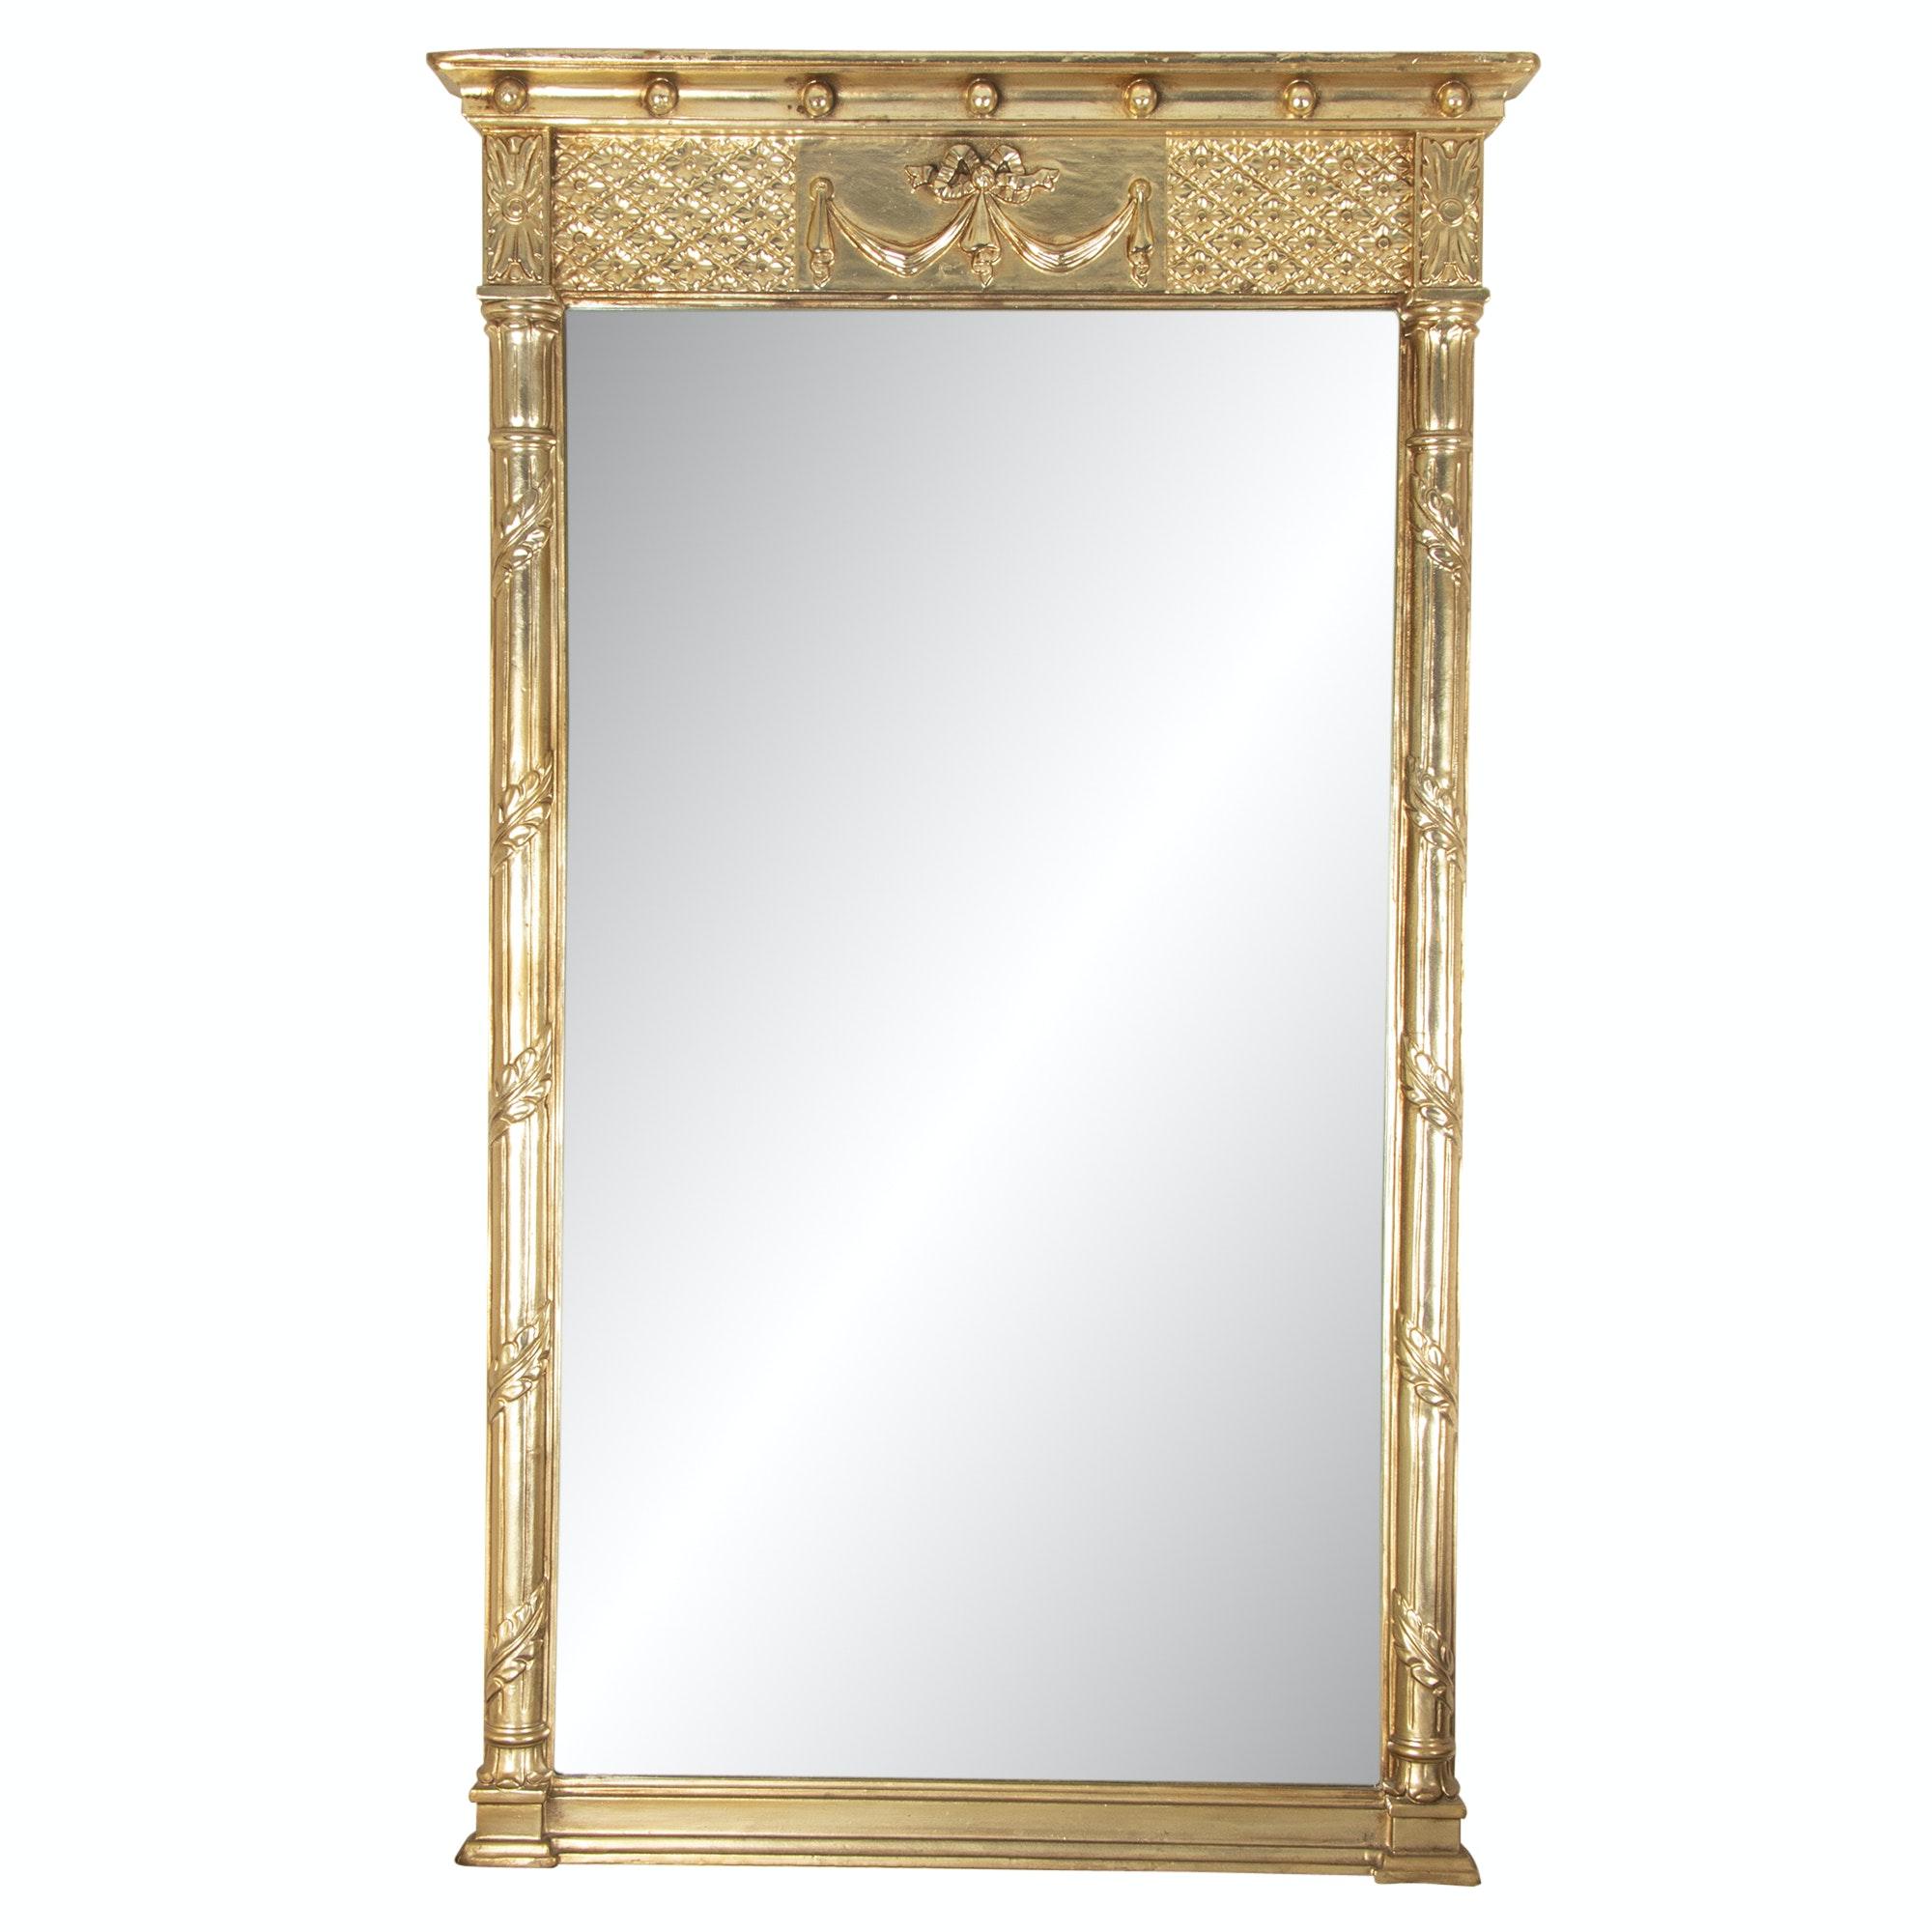 Victorian Style Gilt Gesso on Wood Pier Mirror